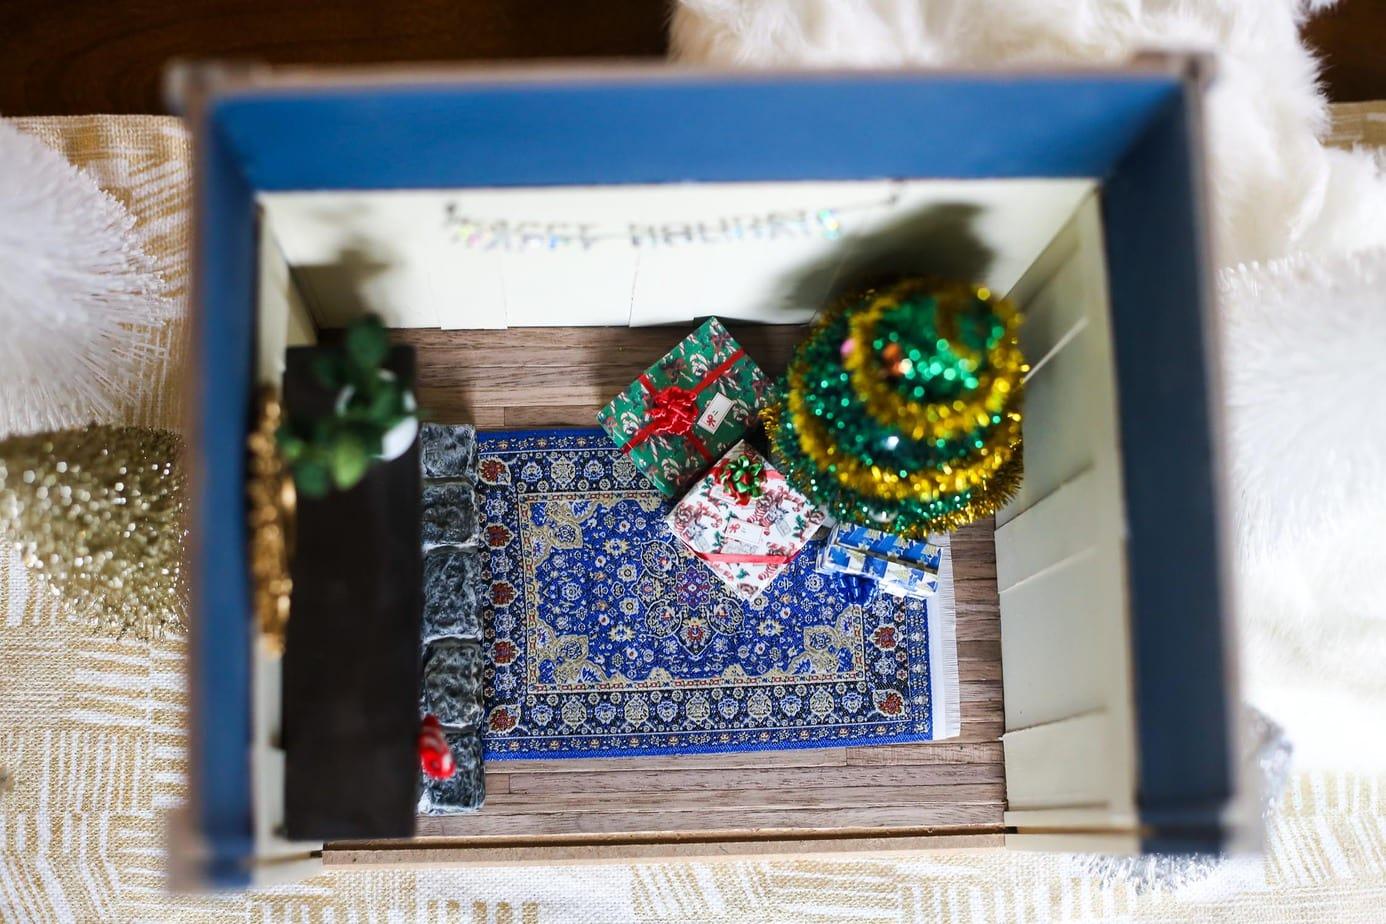 Adorable miniature room for Christmas